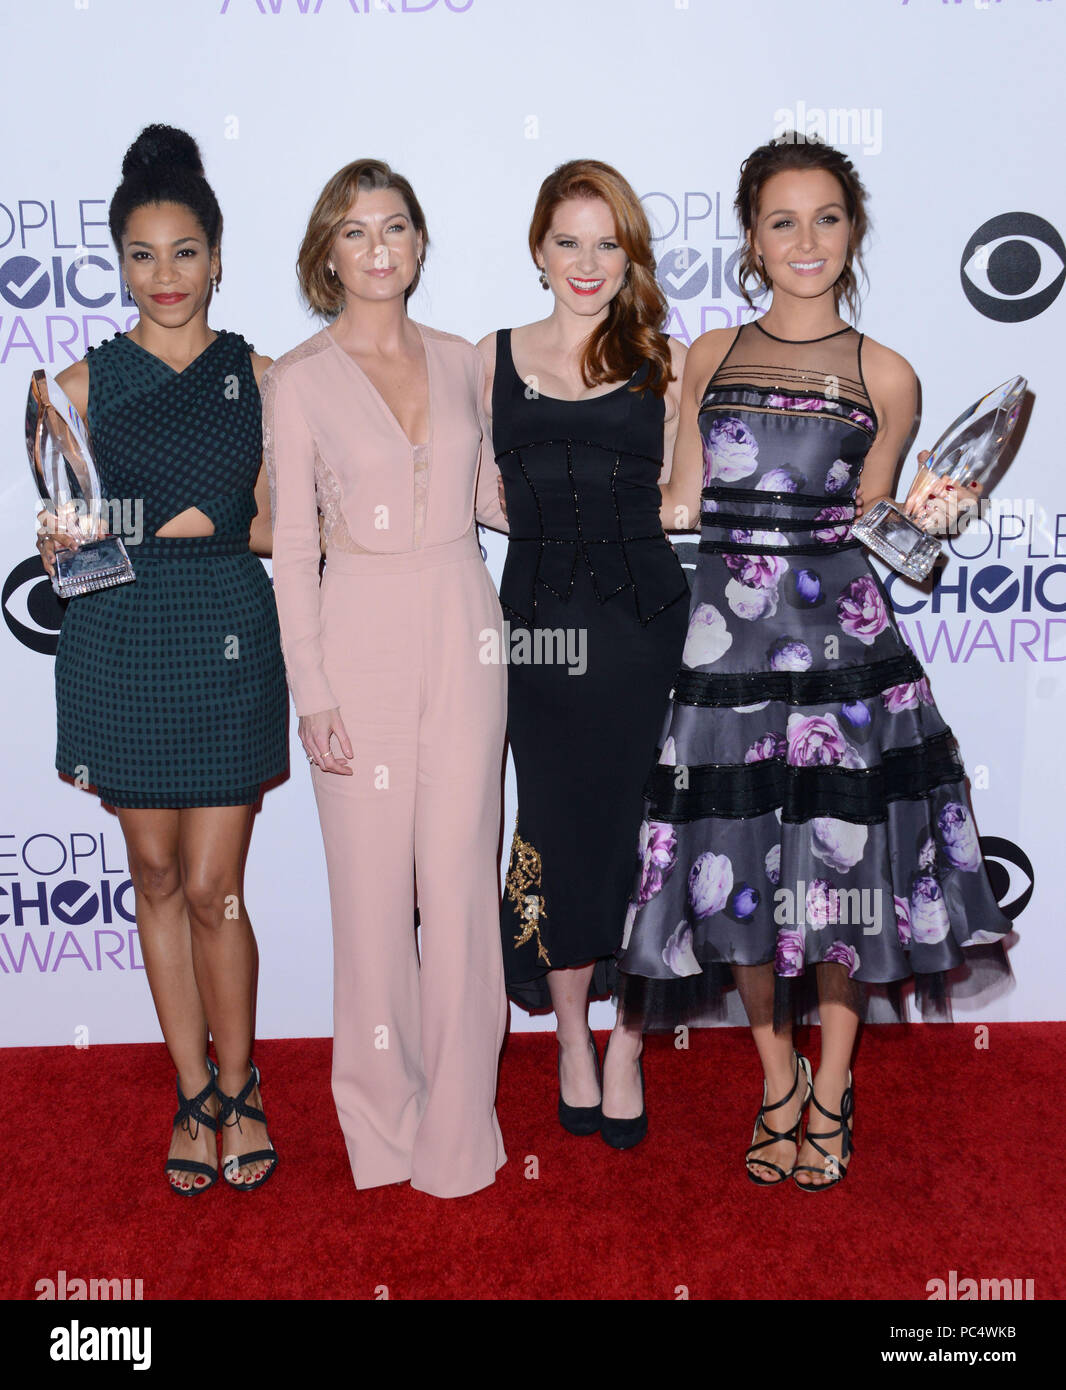 Greys Anatomy Cast Stock Photos & Greys Anatomy Cast Stock Images ...